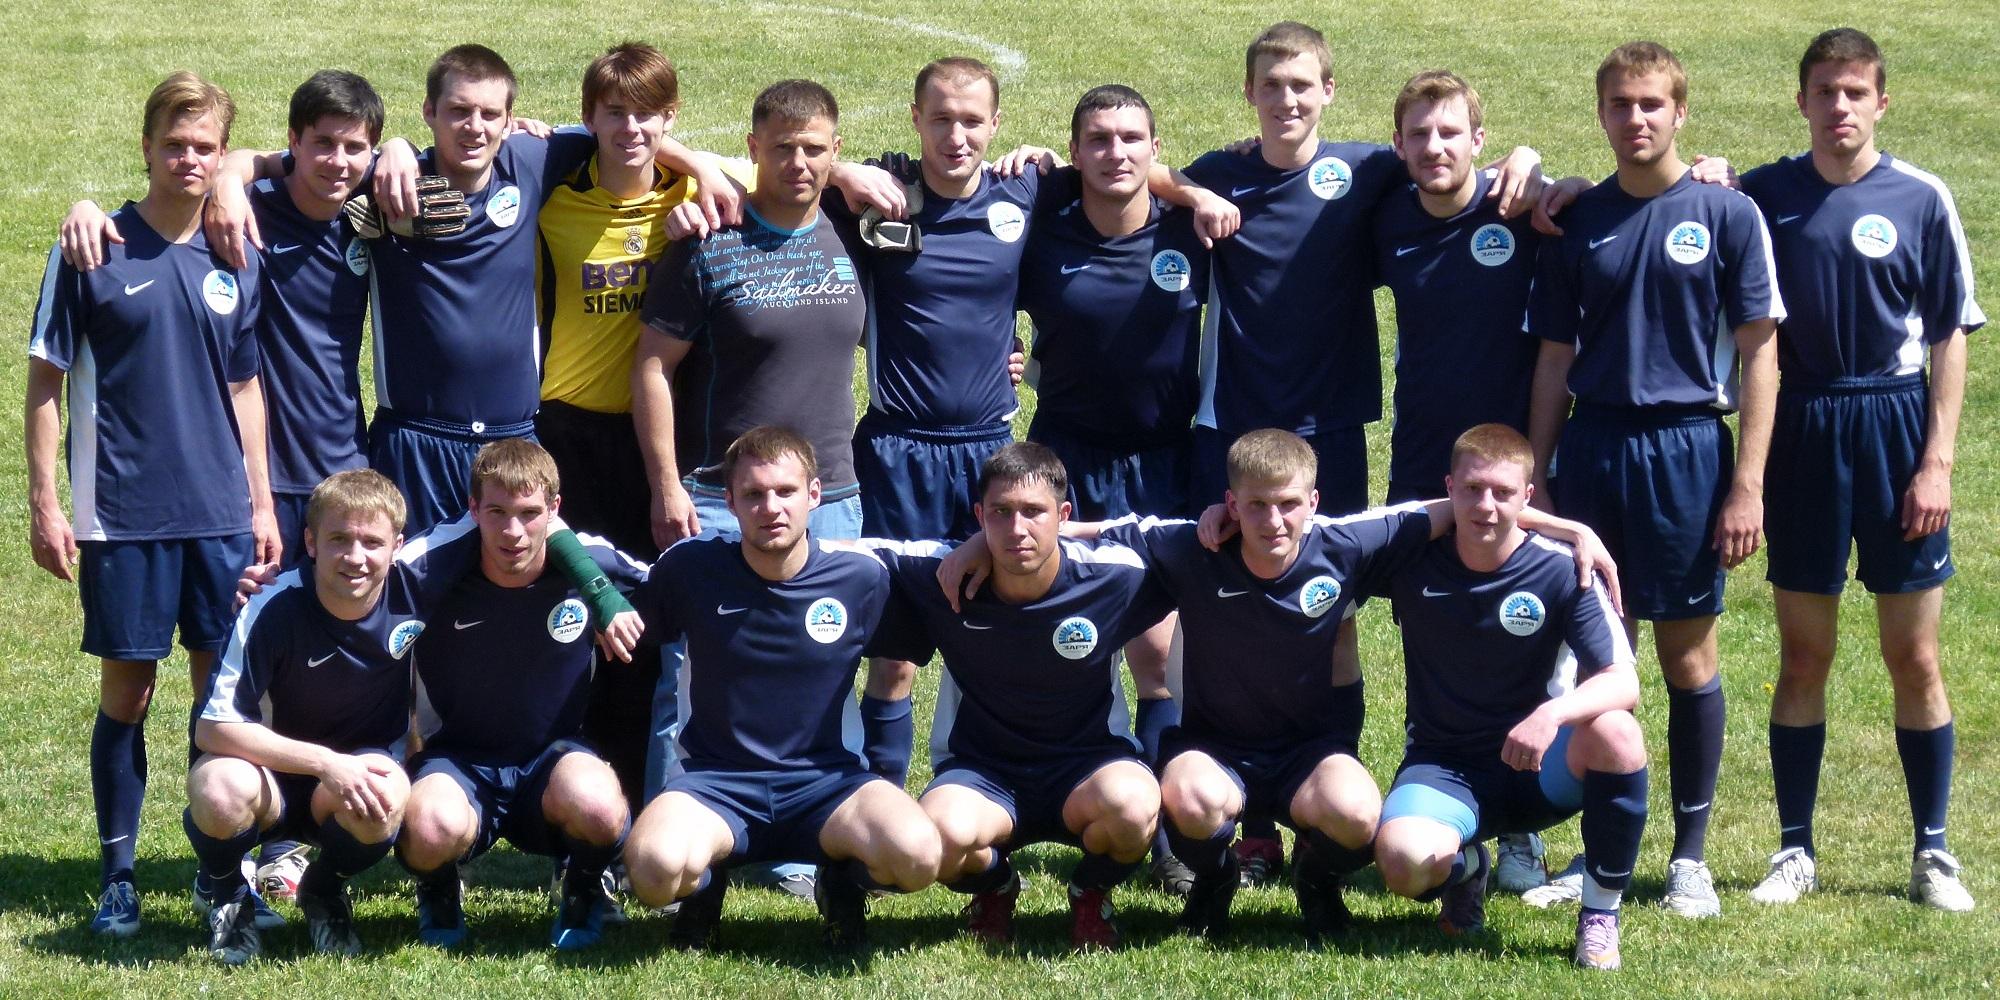 ФК Заря 2011